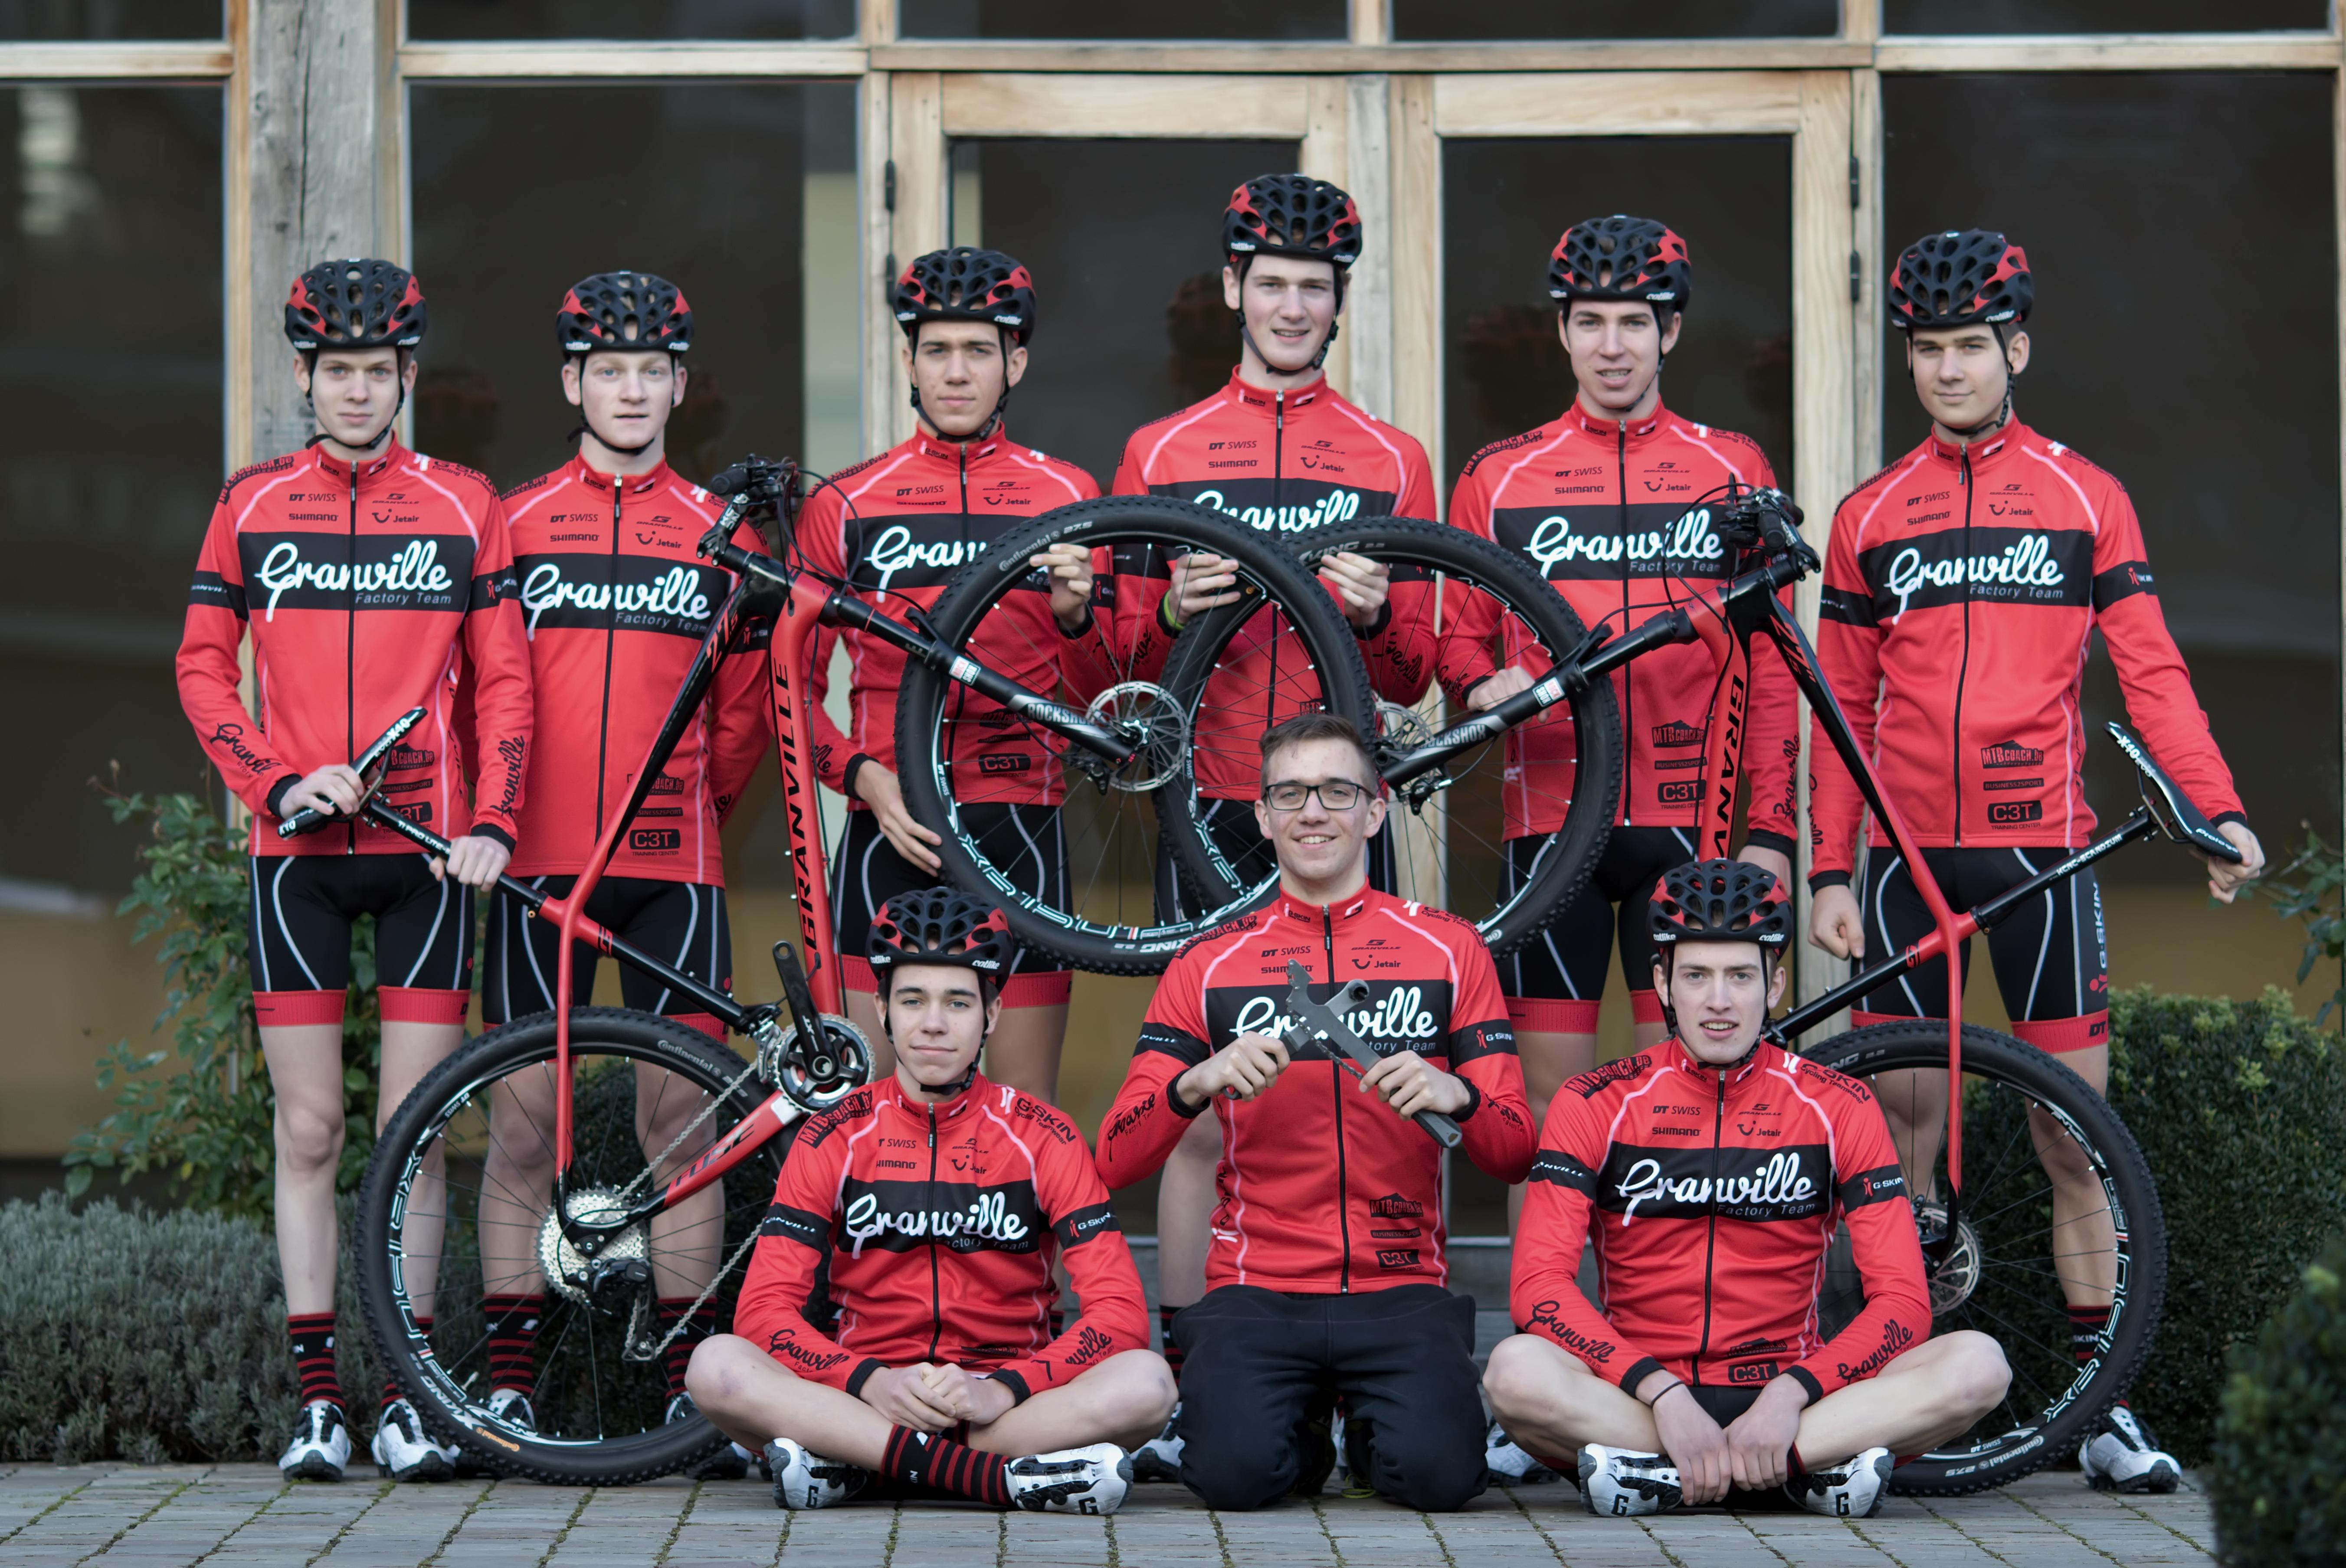 Granville Factory team zonder UCI status in 2017